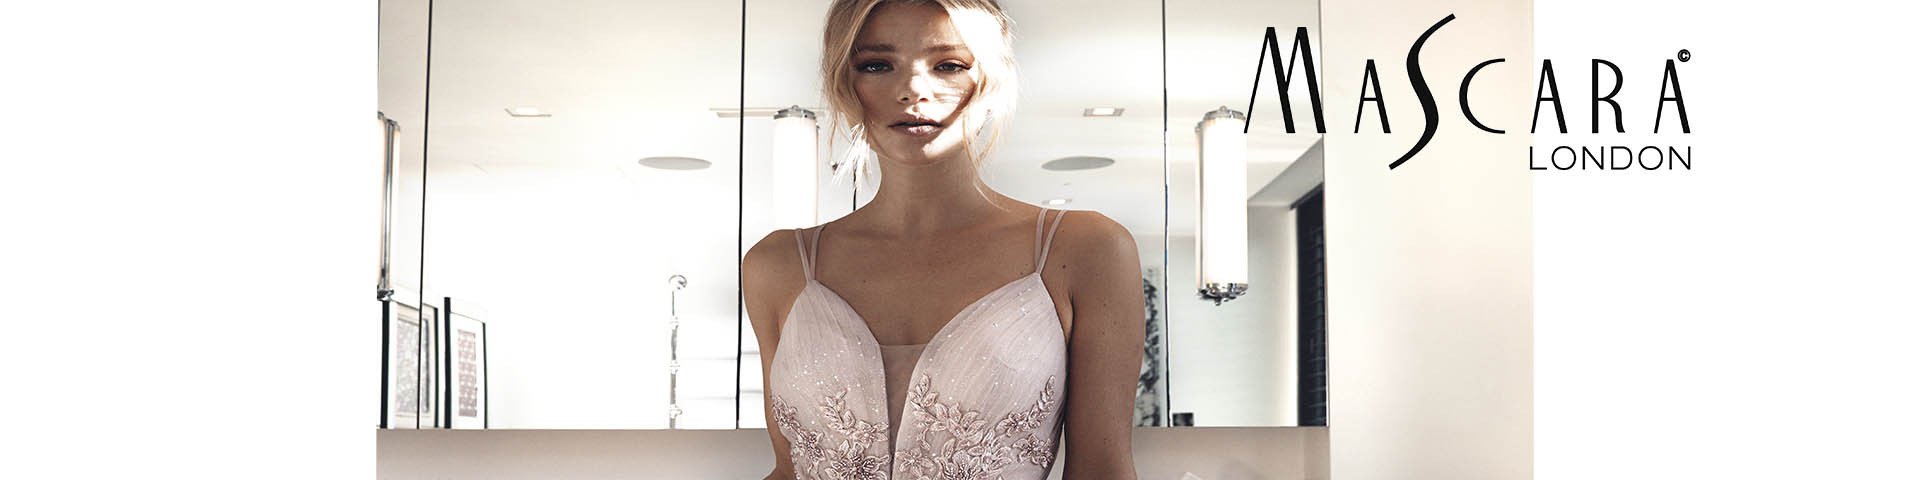 17 Elegant Zalando Mascara Abendkleid Boutique13 Wunderbar Zalando Mascara Abendkleid Galerie